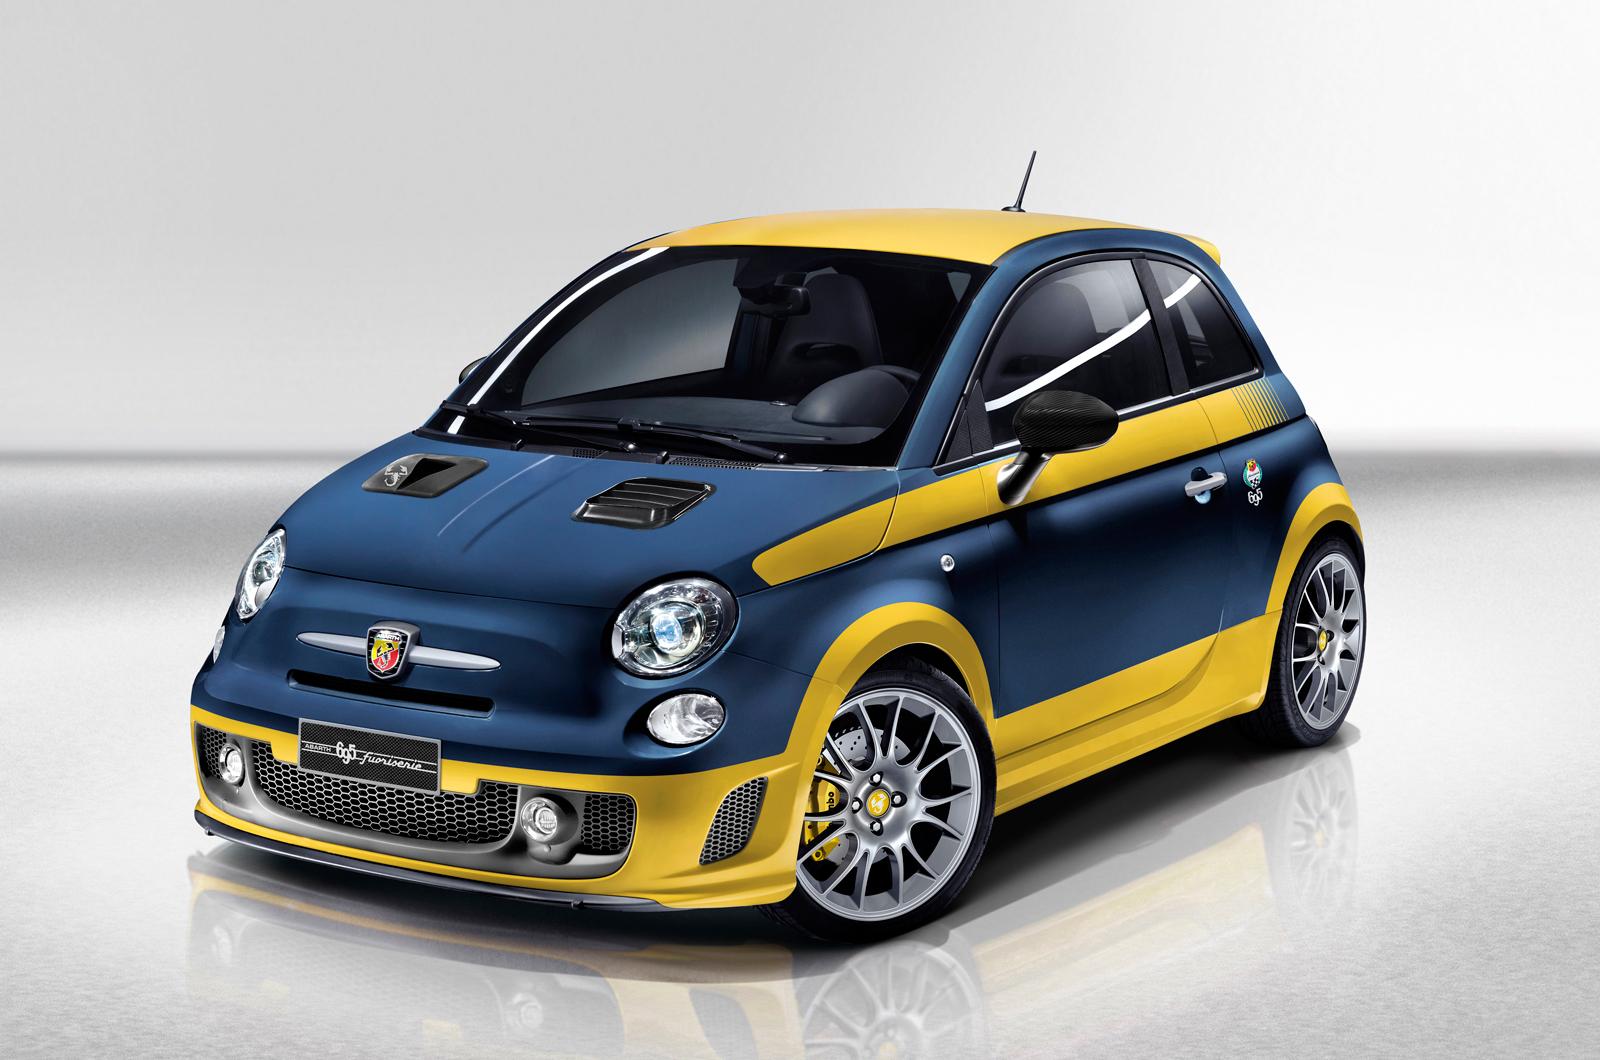 paris motor show 2012 gallery car gallery budget hatchbacks autocar india. Black Bedroom Furniture Sets. Home Design Ideas